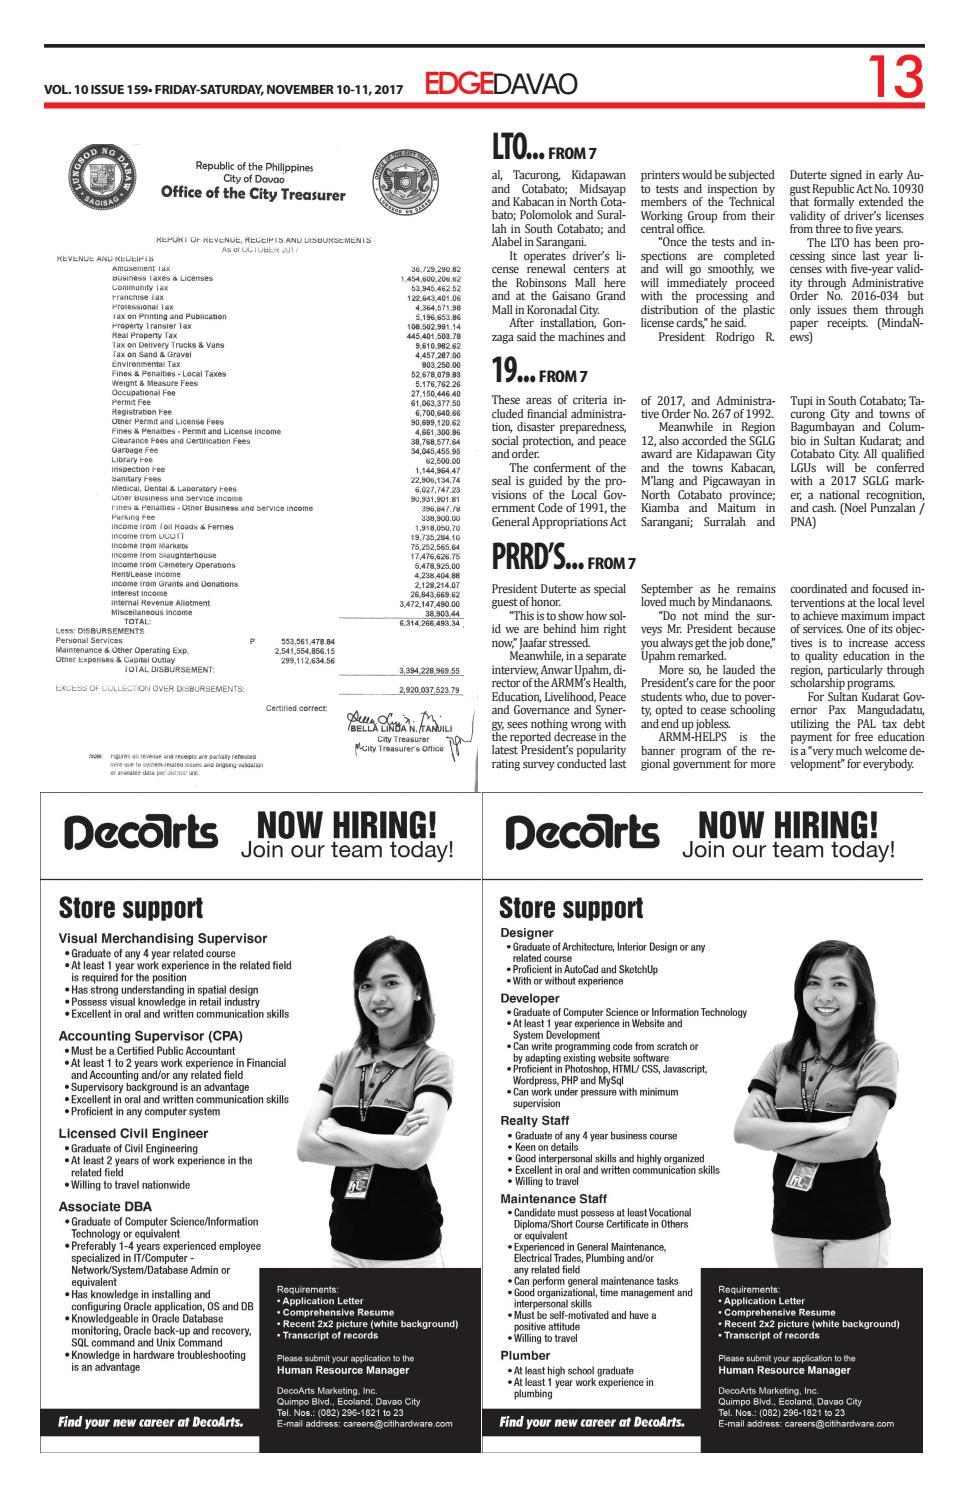 Edge10 issue159 November 10-11, 2017